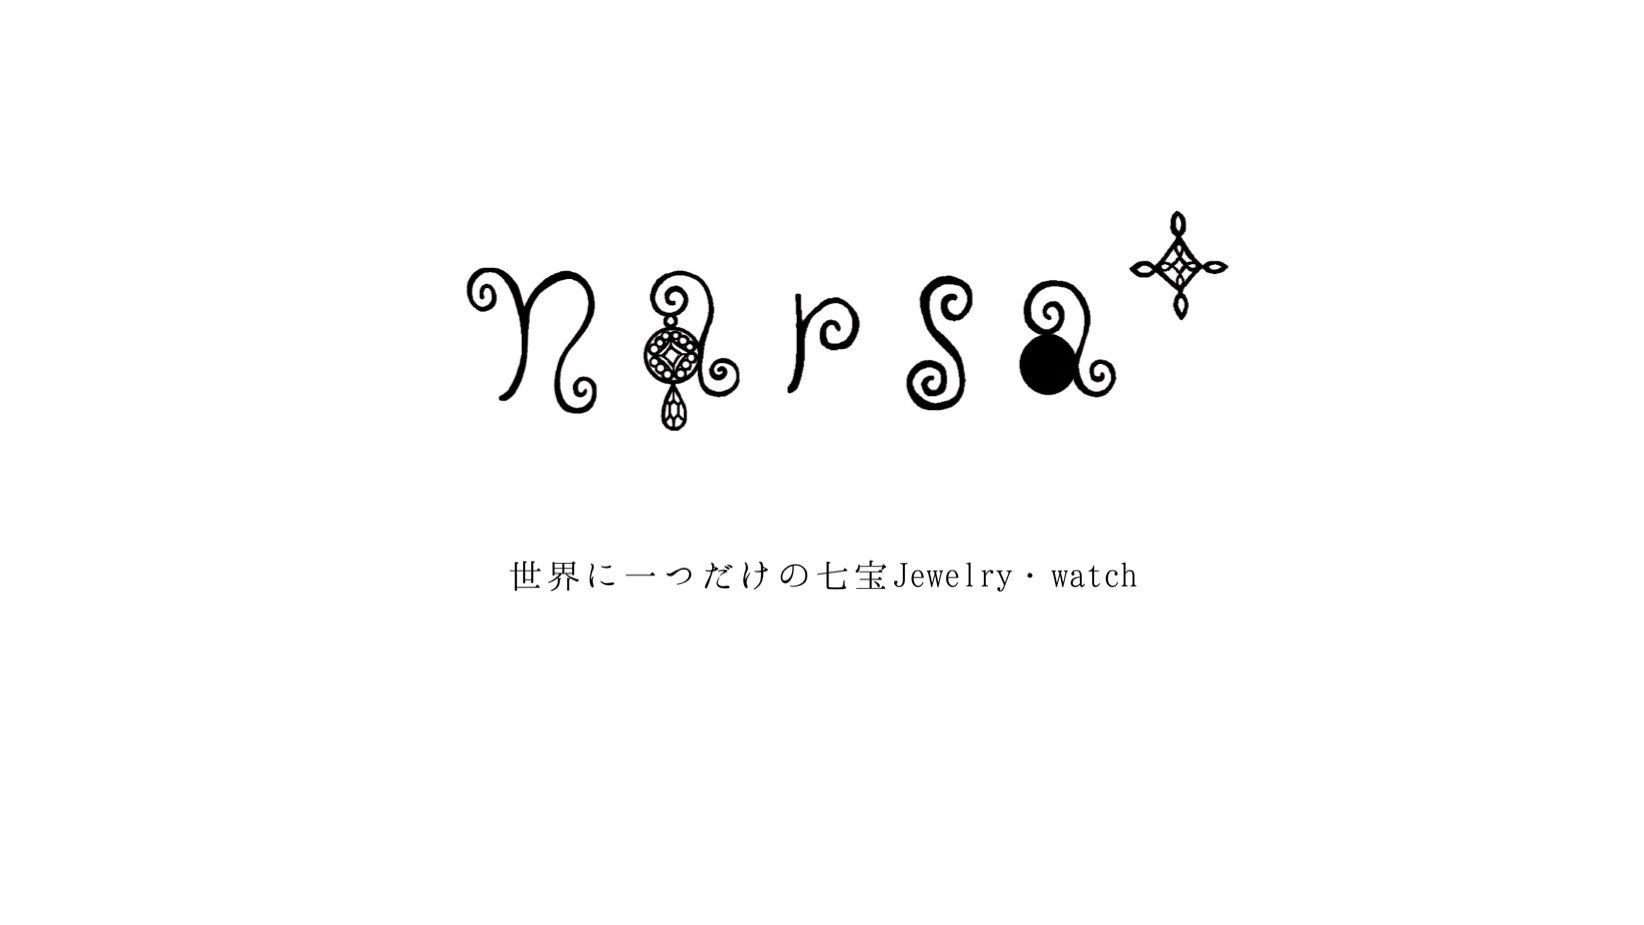 narsa*世界に一つだけの七宝Jewelry・watch